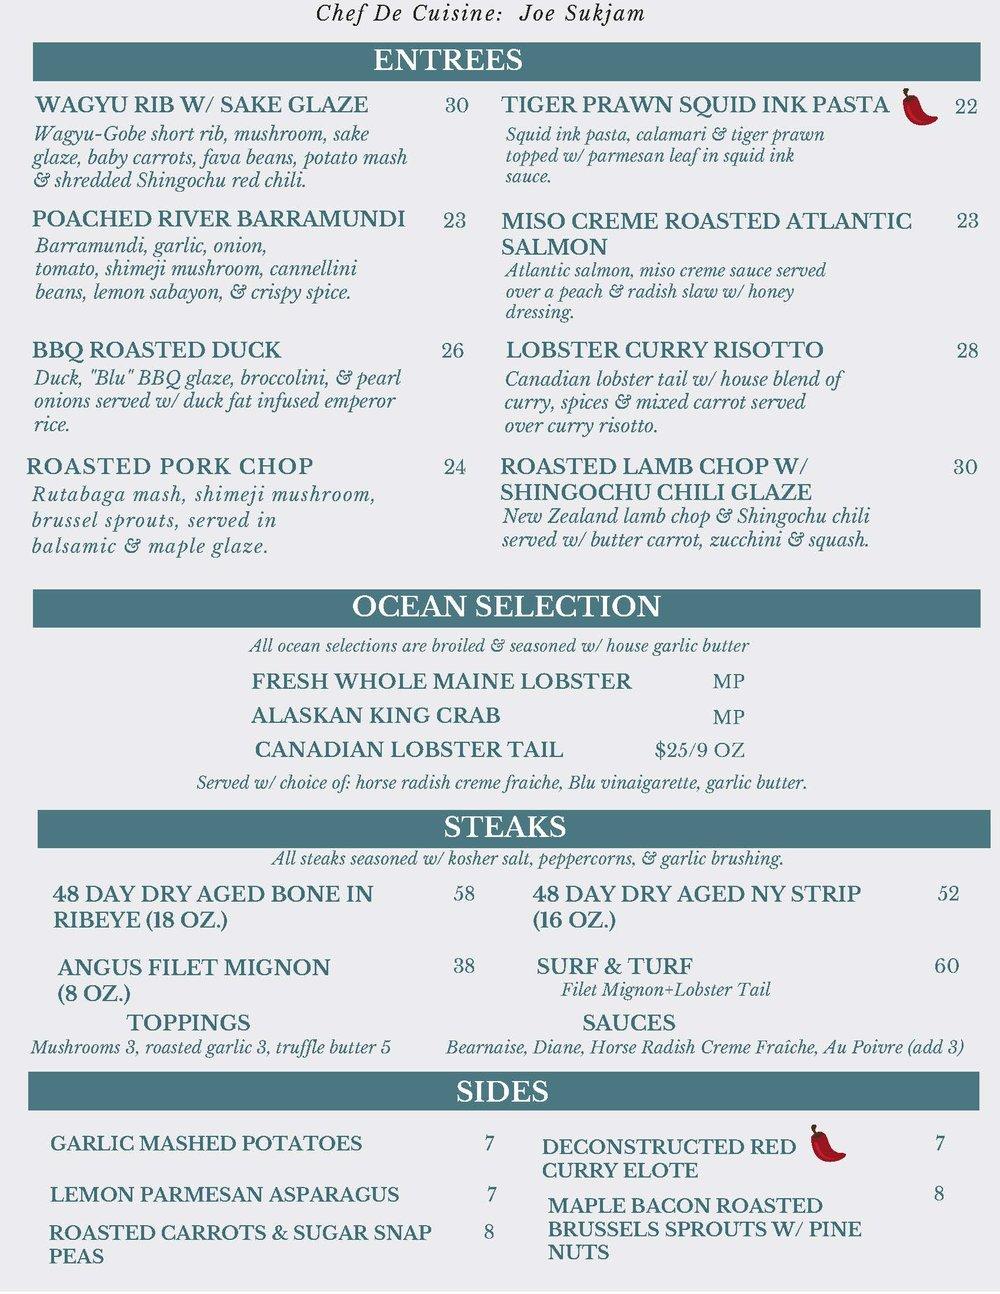 Blu 57 Seafood & Small Plates image 1